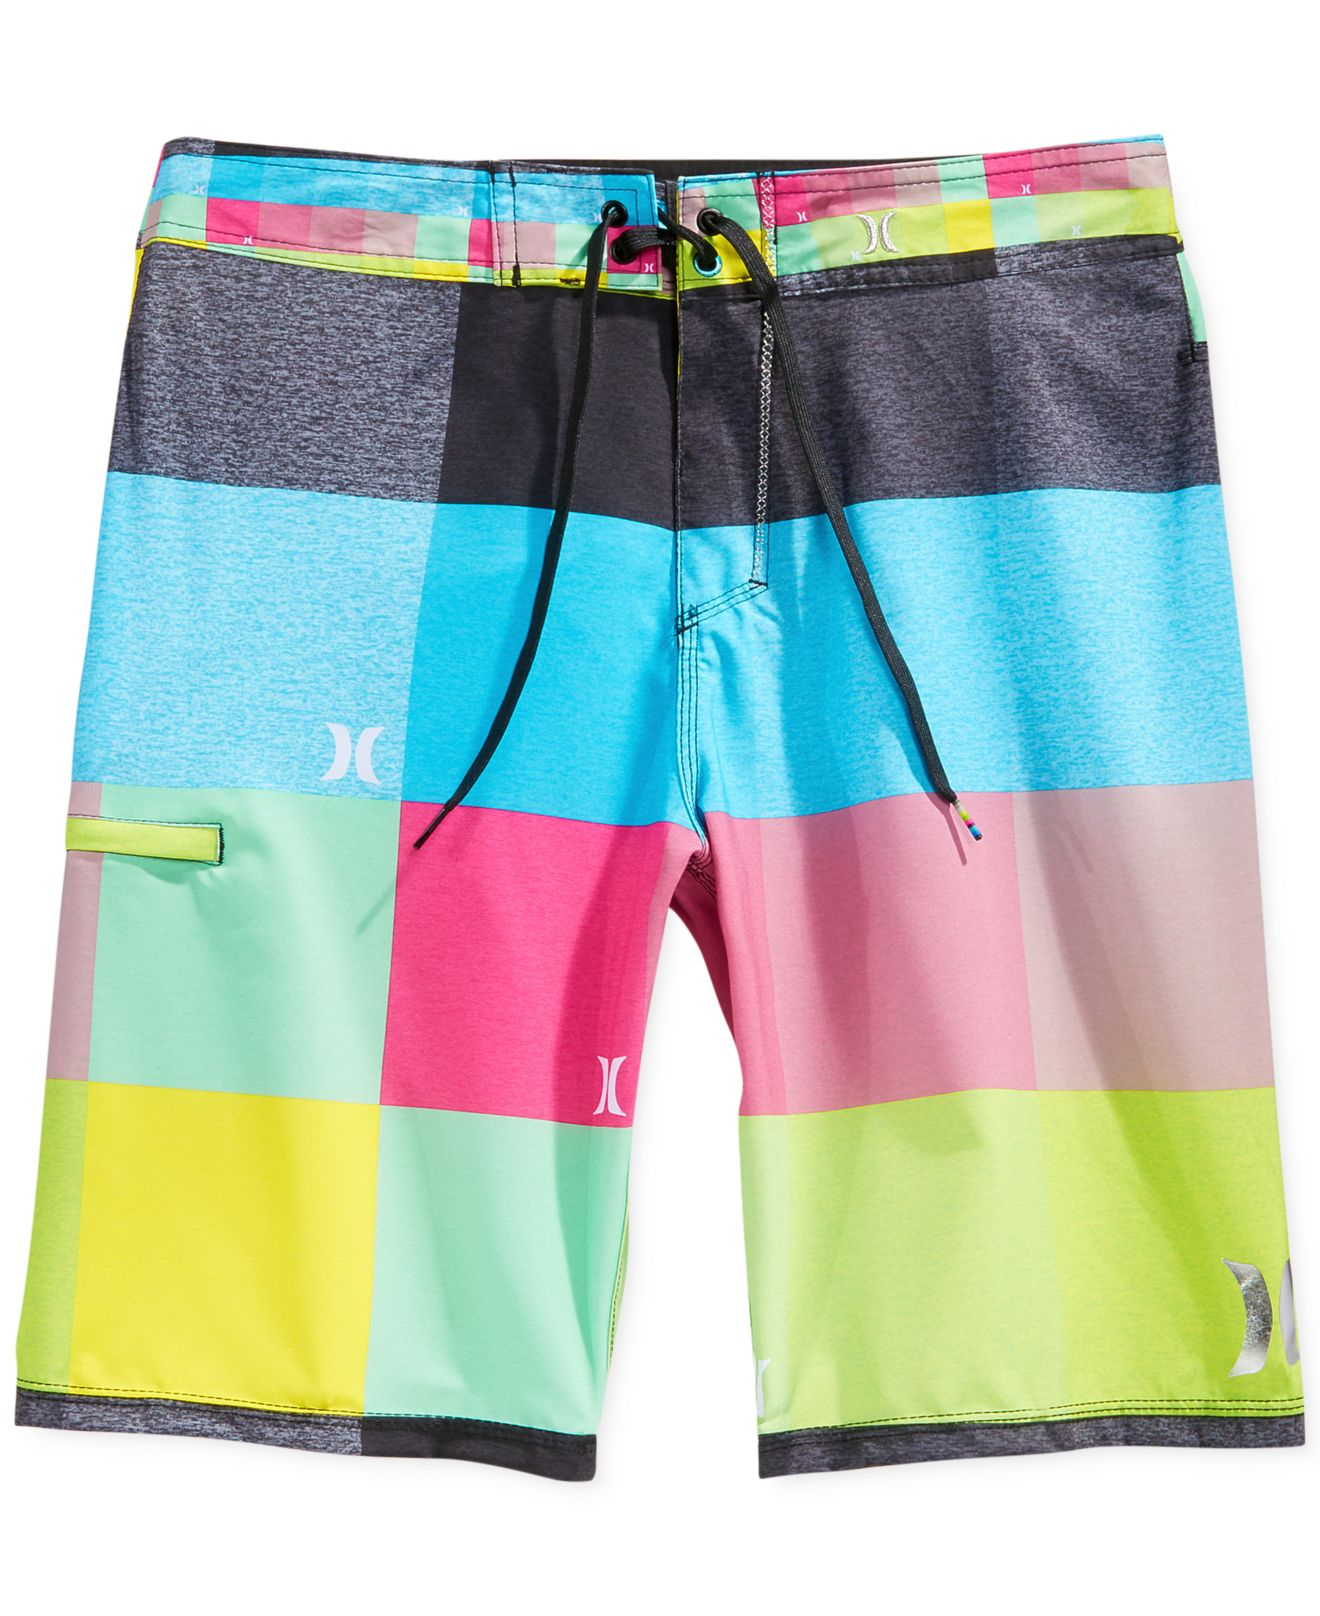 694332fe09 Hurley Phantom Heathered Kingsroad Board Shorts for Men - Lyst